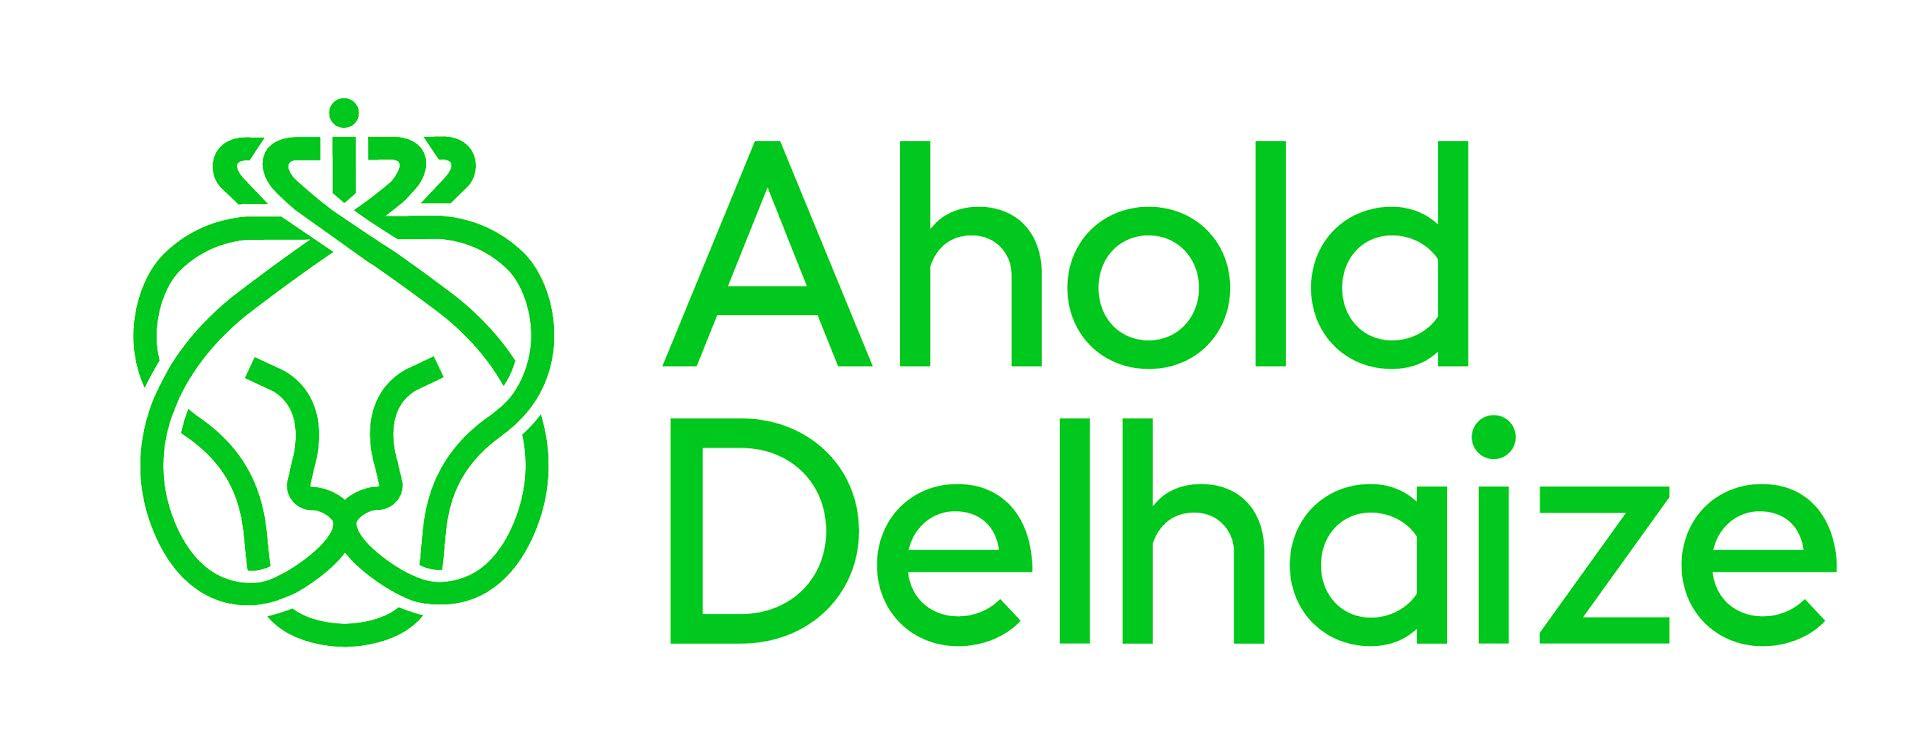 Ahold Logos